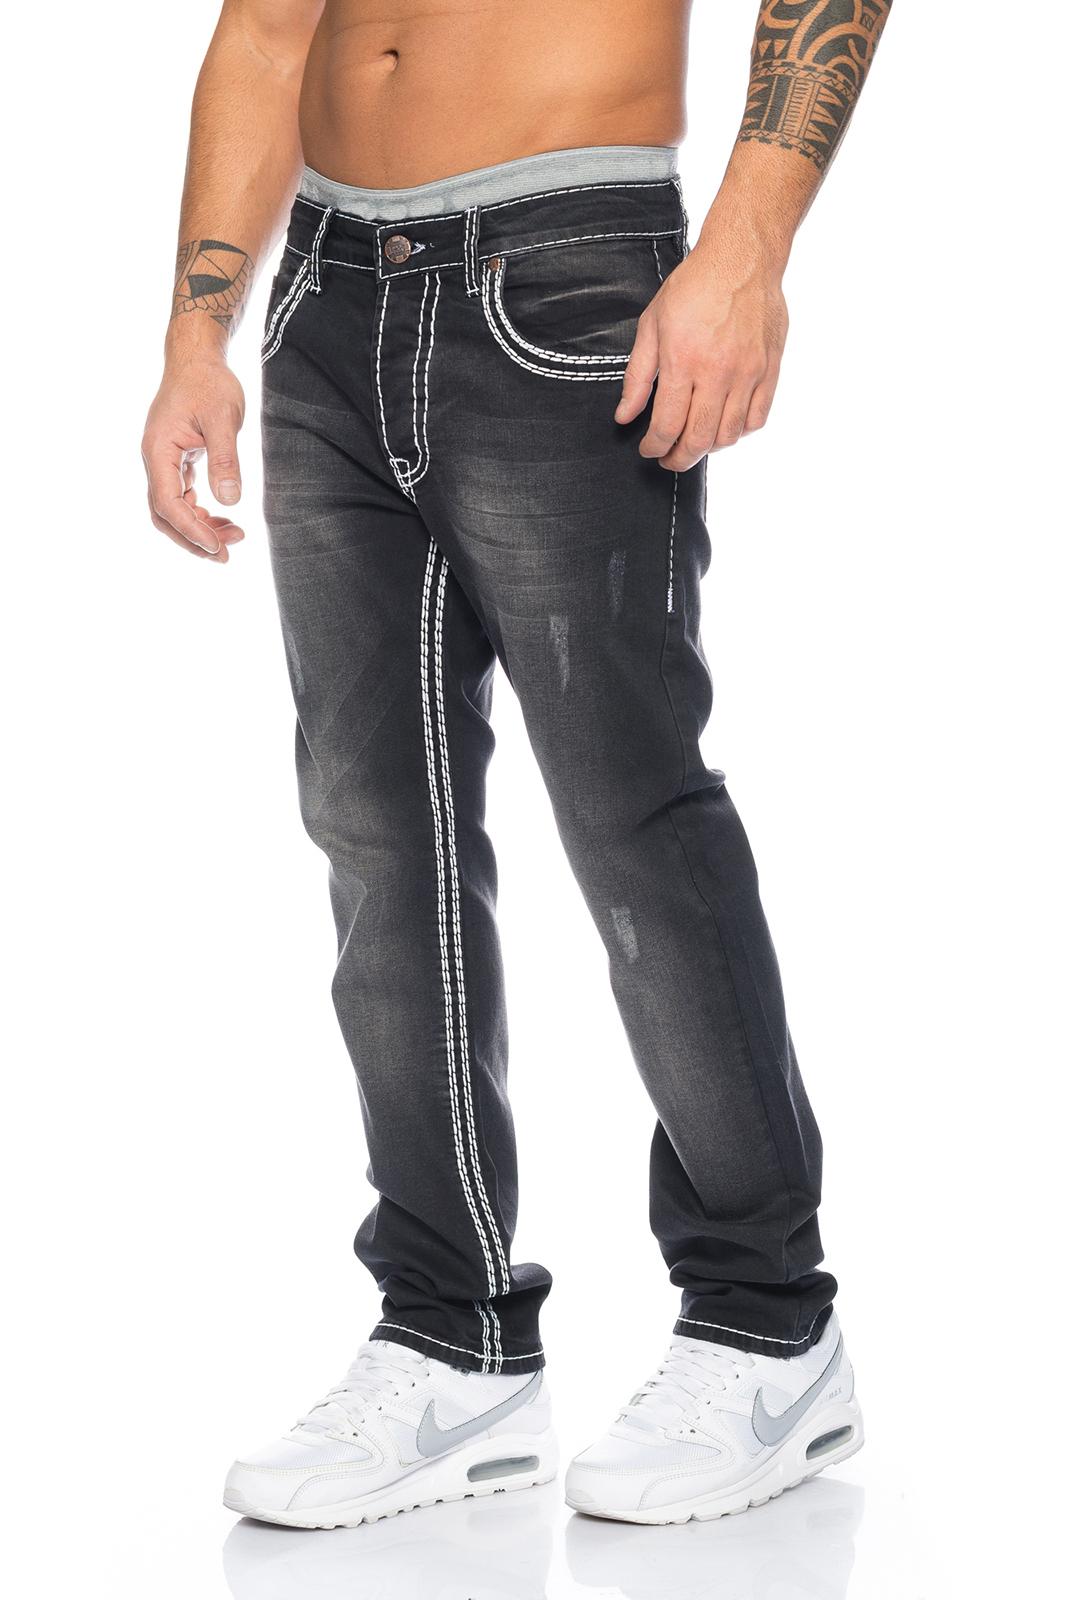 herren designer jeans hose grau dicke naht w29 w44 used. Black Bedroom Furniture Sets. Home Design Ideas